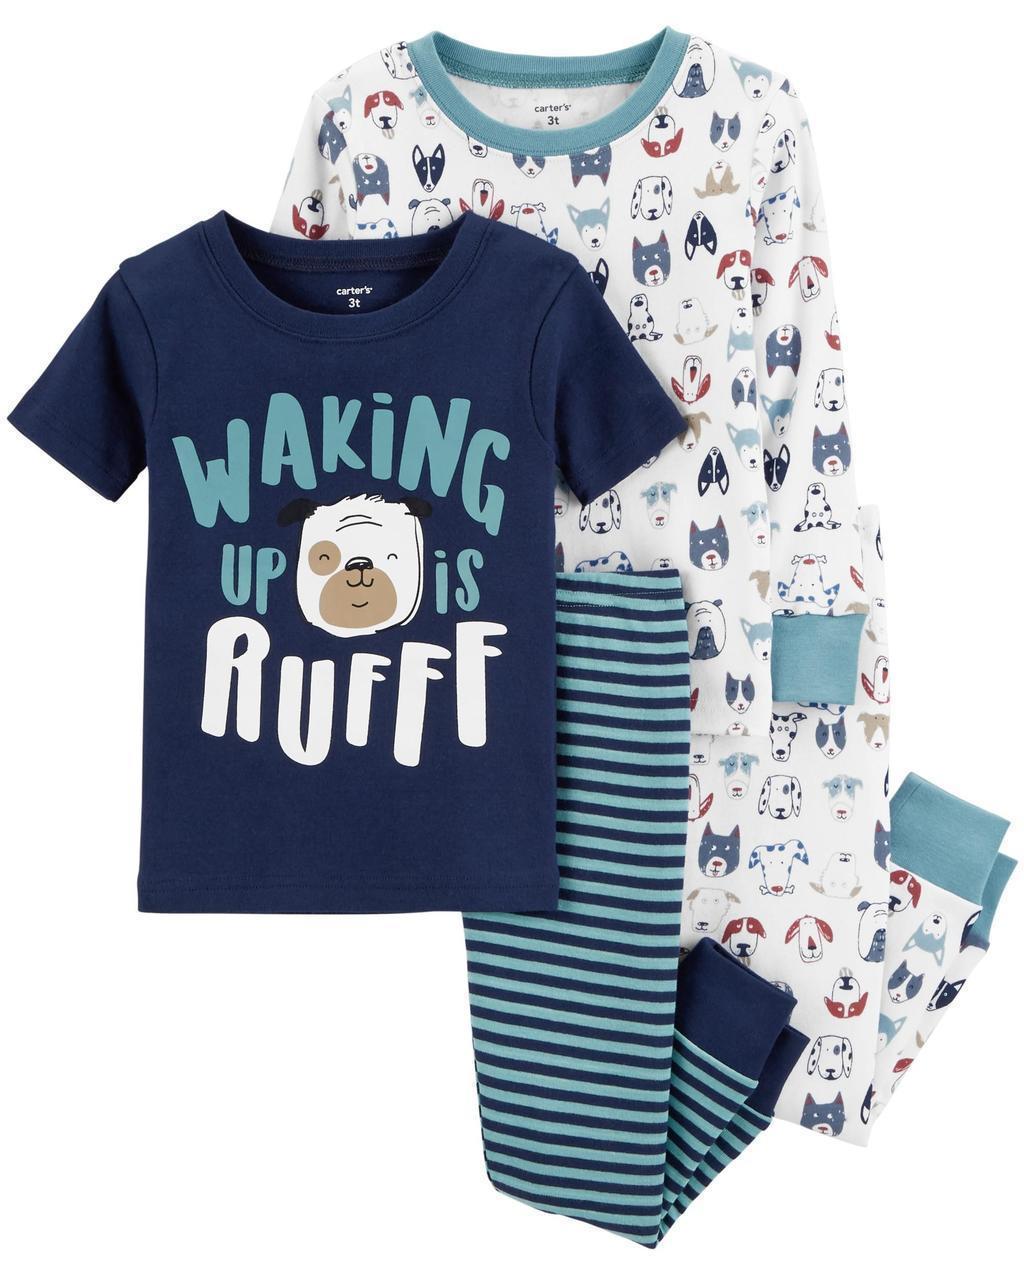 Пижама Картерс (Carter's) для мальчика 2Т